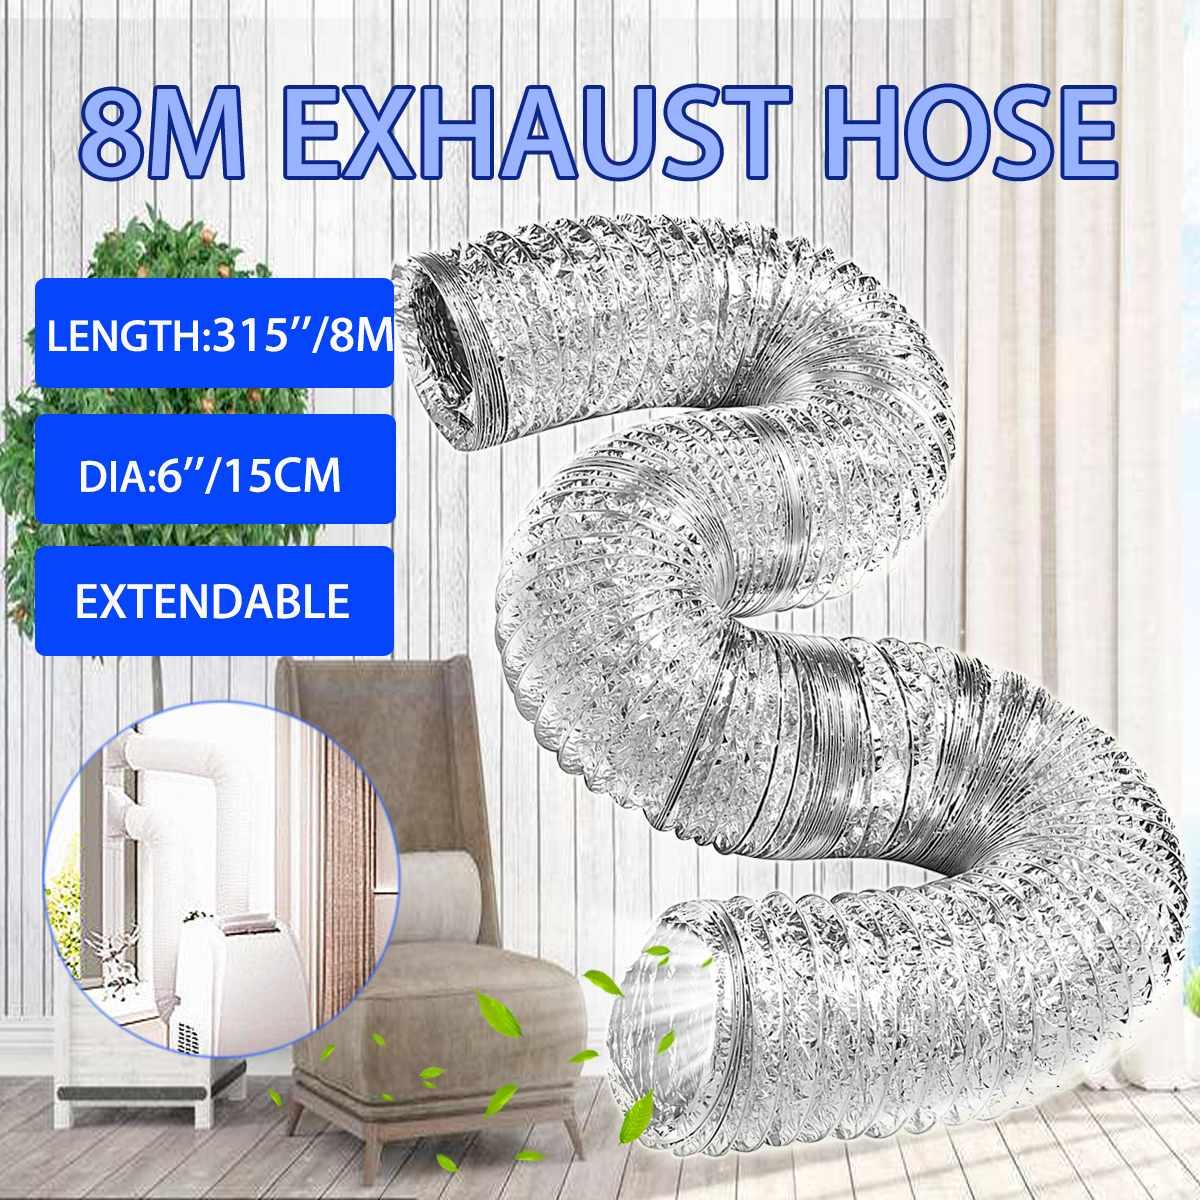 US $13.15 41% OFF|1pcs 2019 8M Flexible Exhaust Hose Tube Mobile Air on